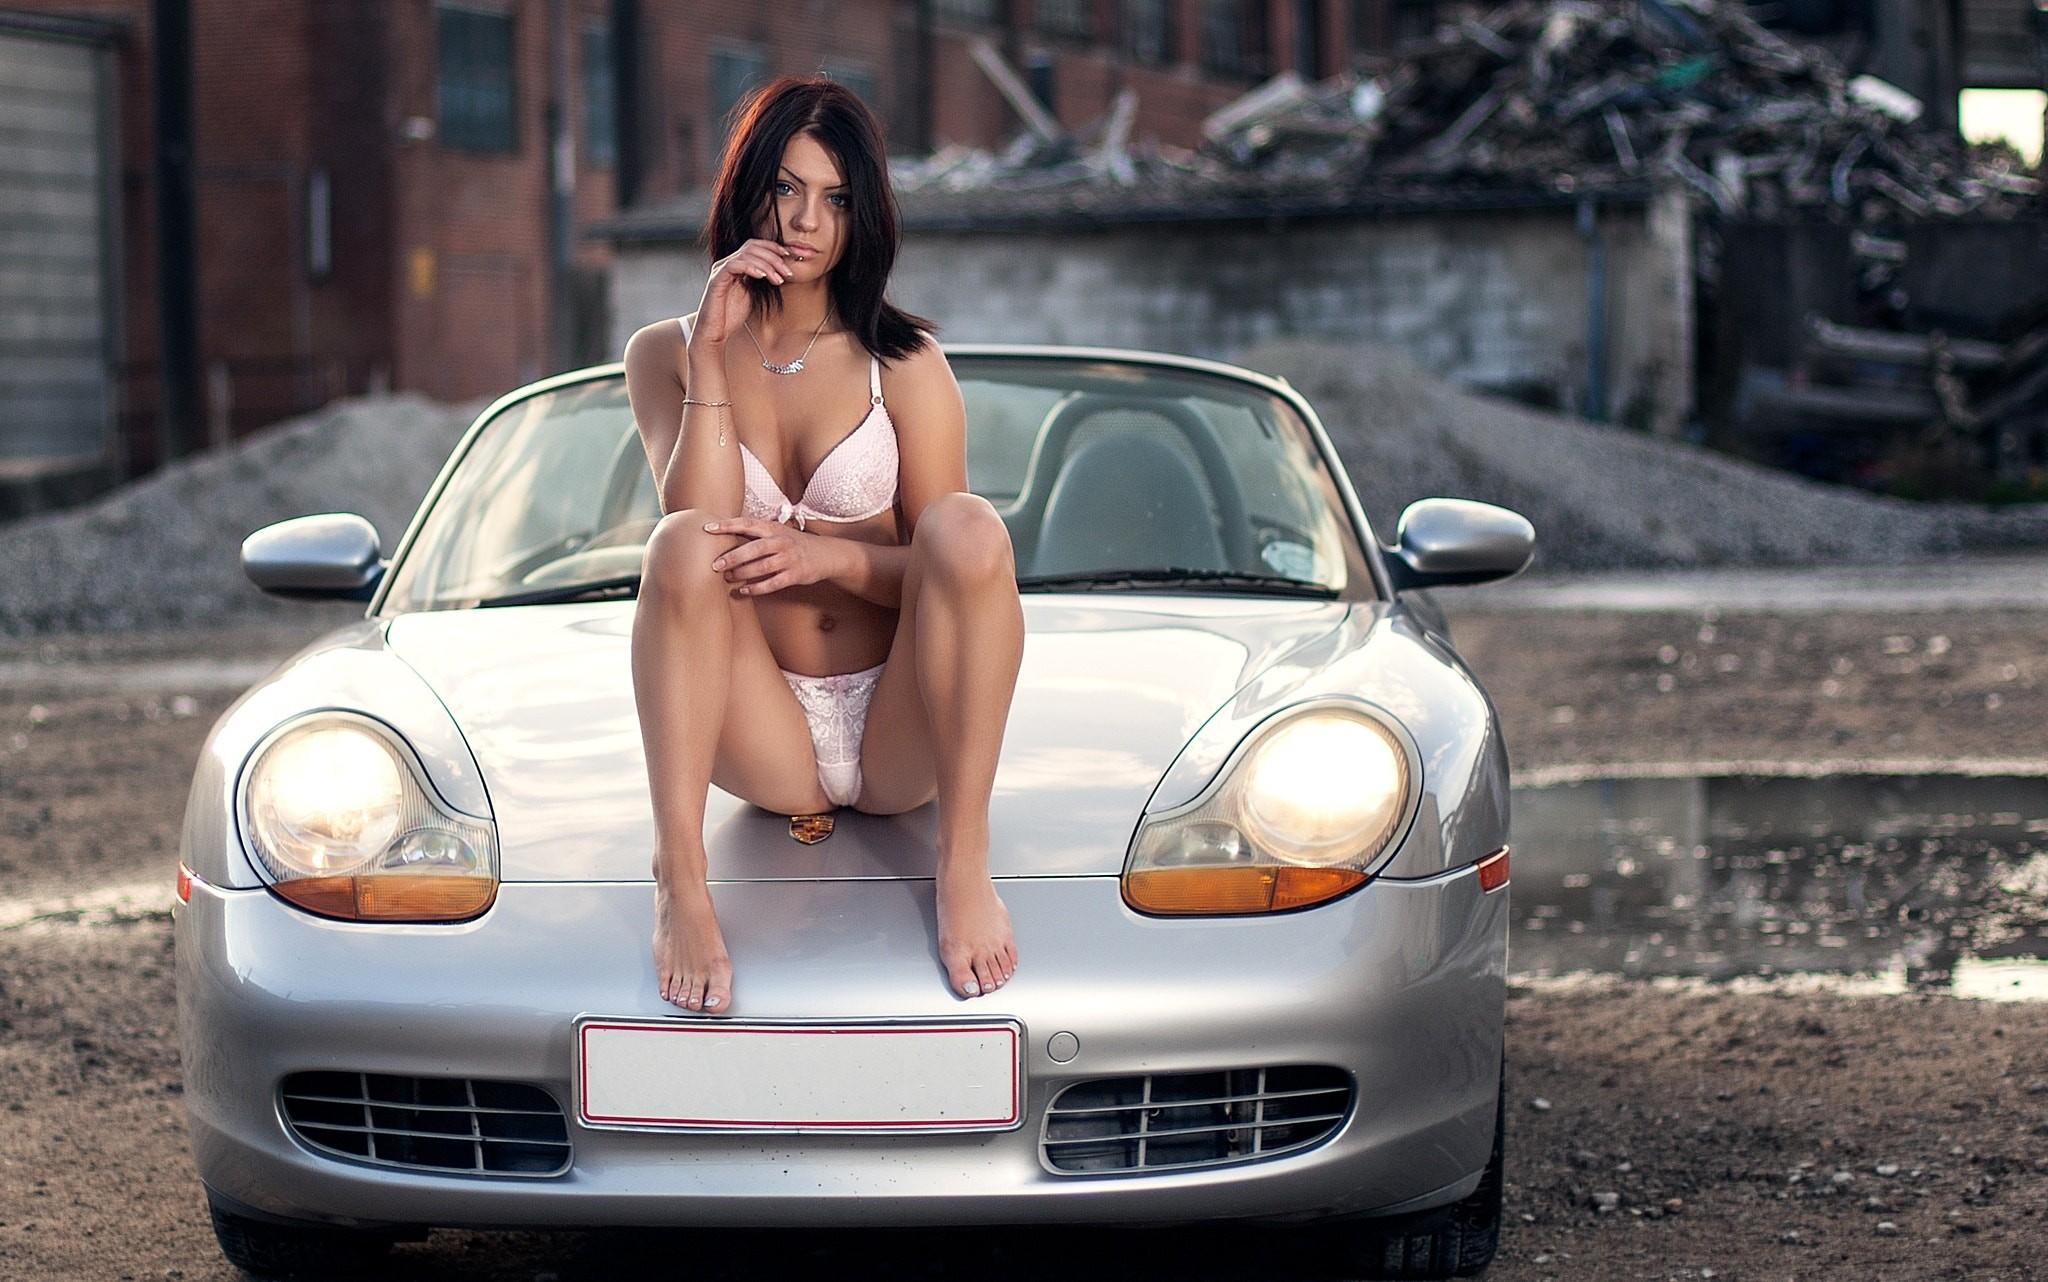 Women Pussy Wet In The Car